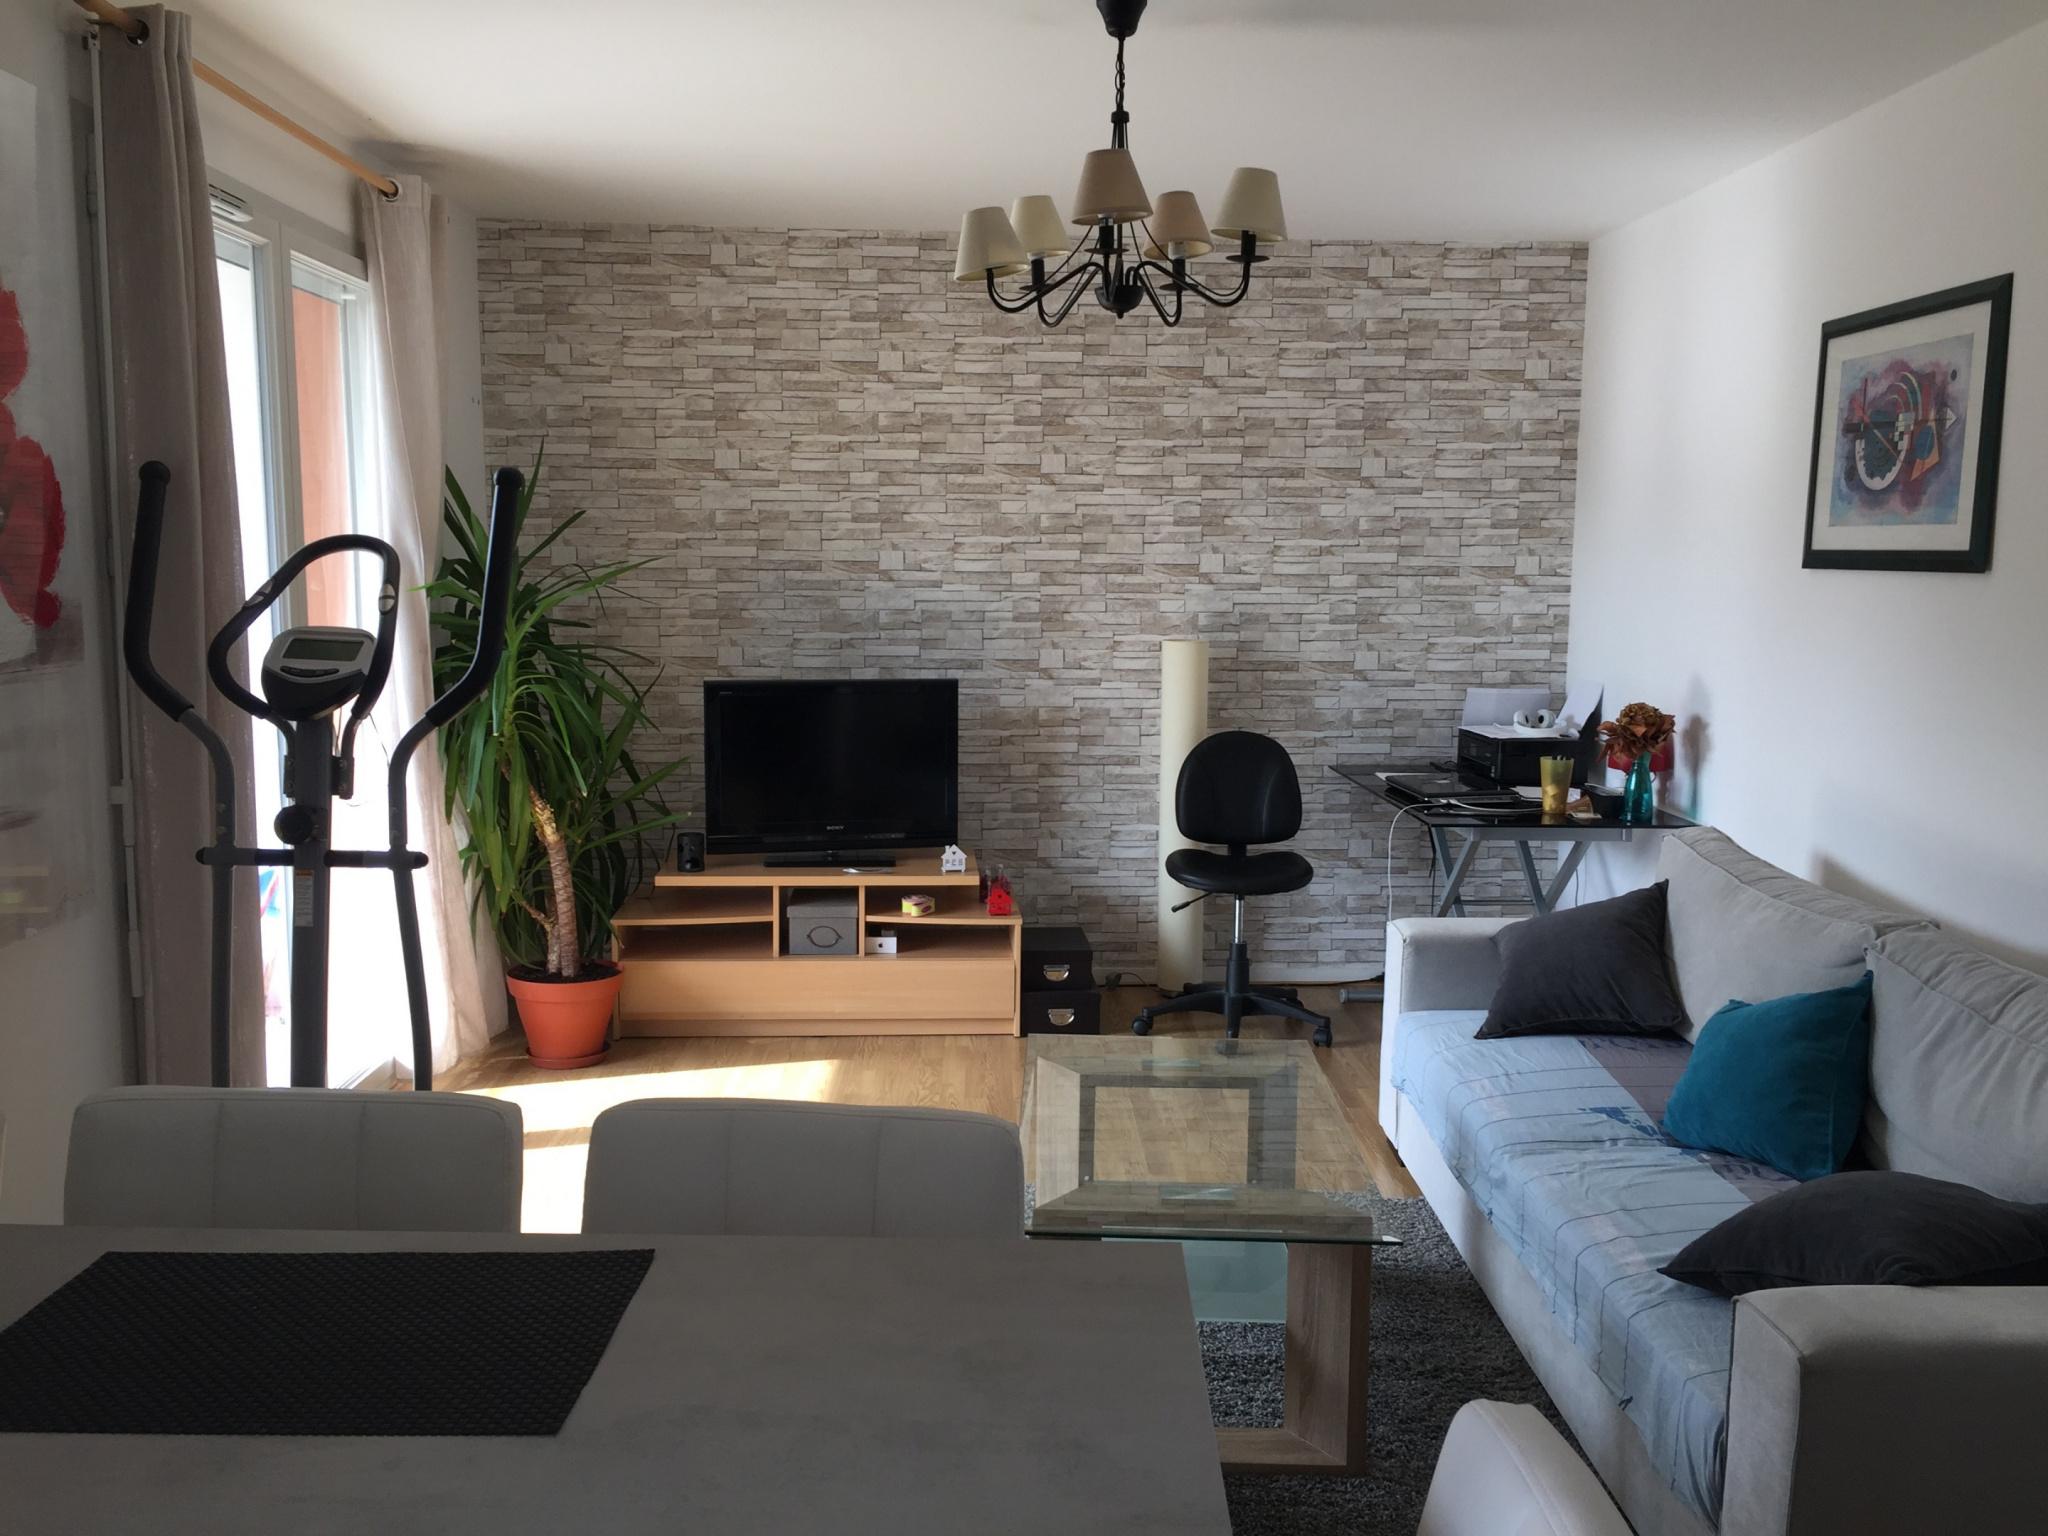 vente appartement meaux. Black Bedroom Furniture Sets. Home Design Ideas